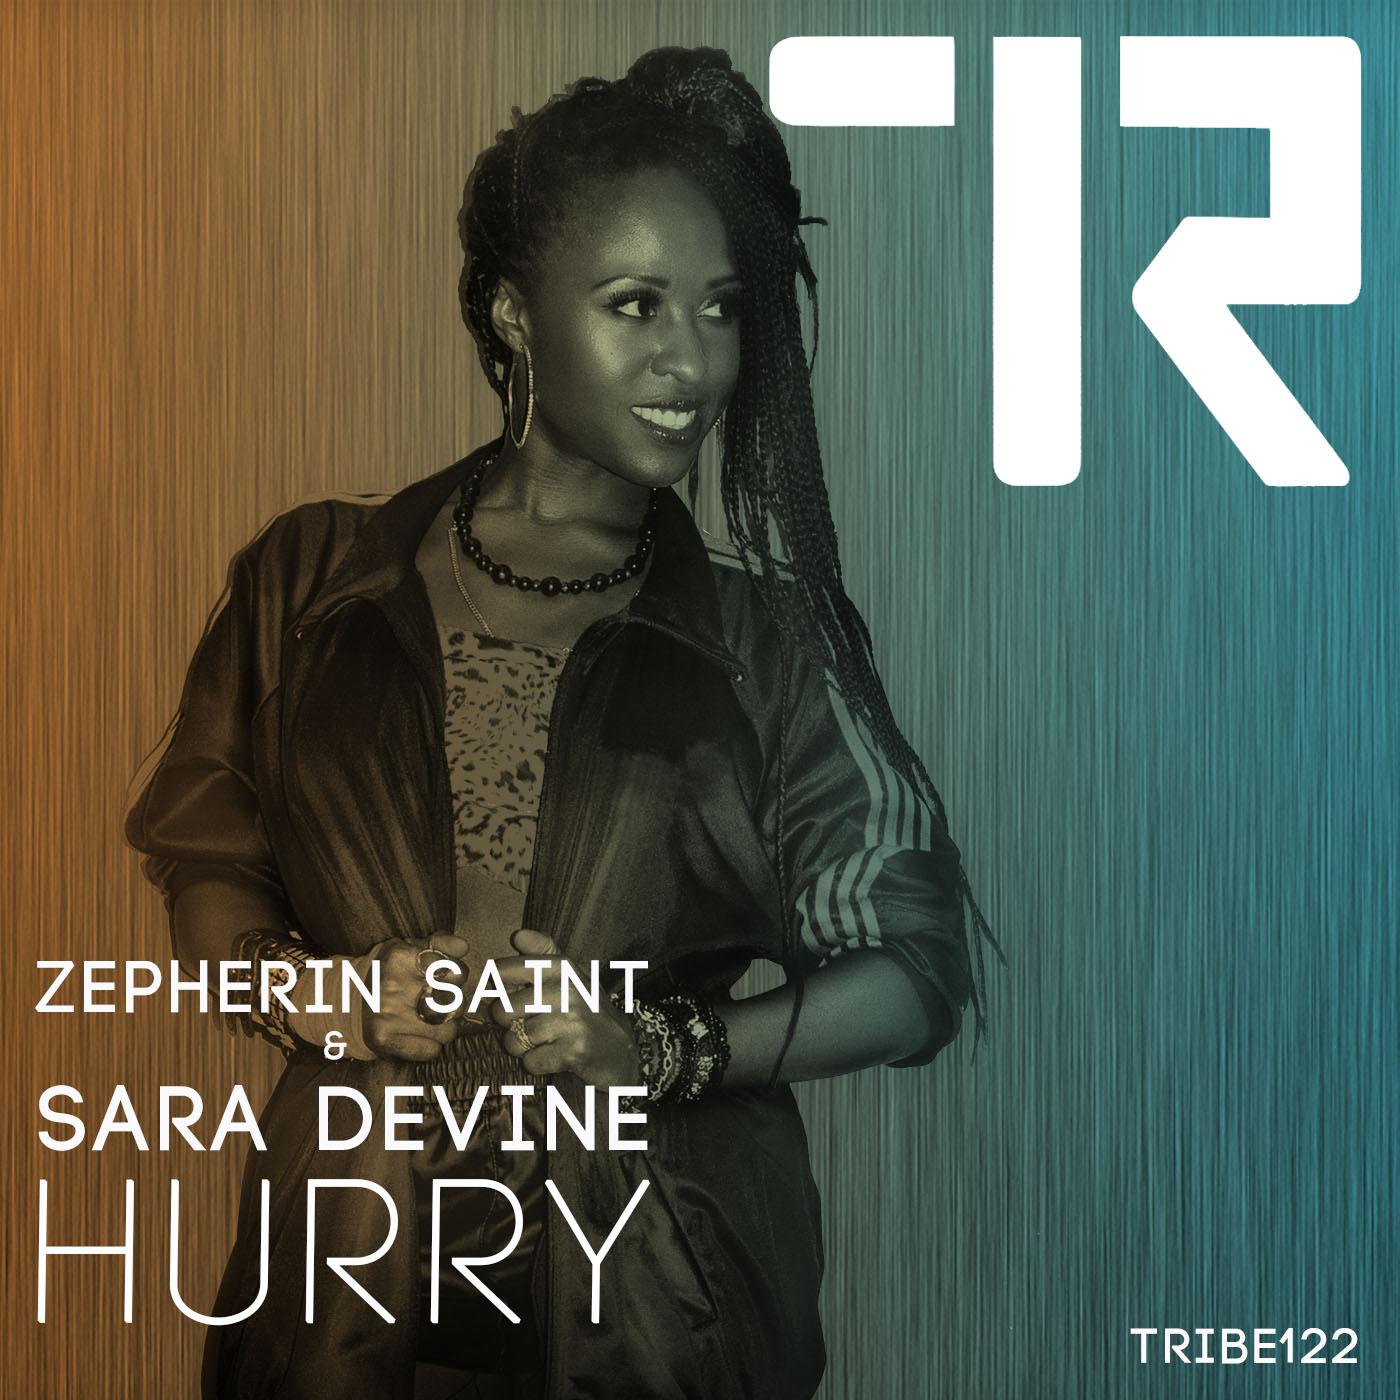 ZEPHERIN SAINT & SARA DEVINE HURRY